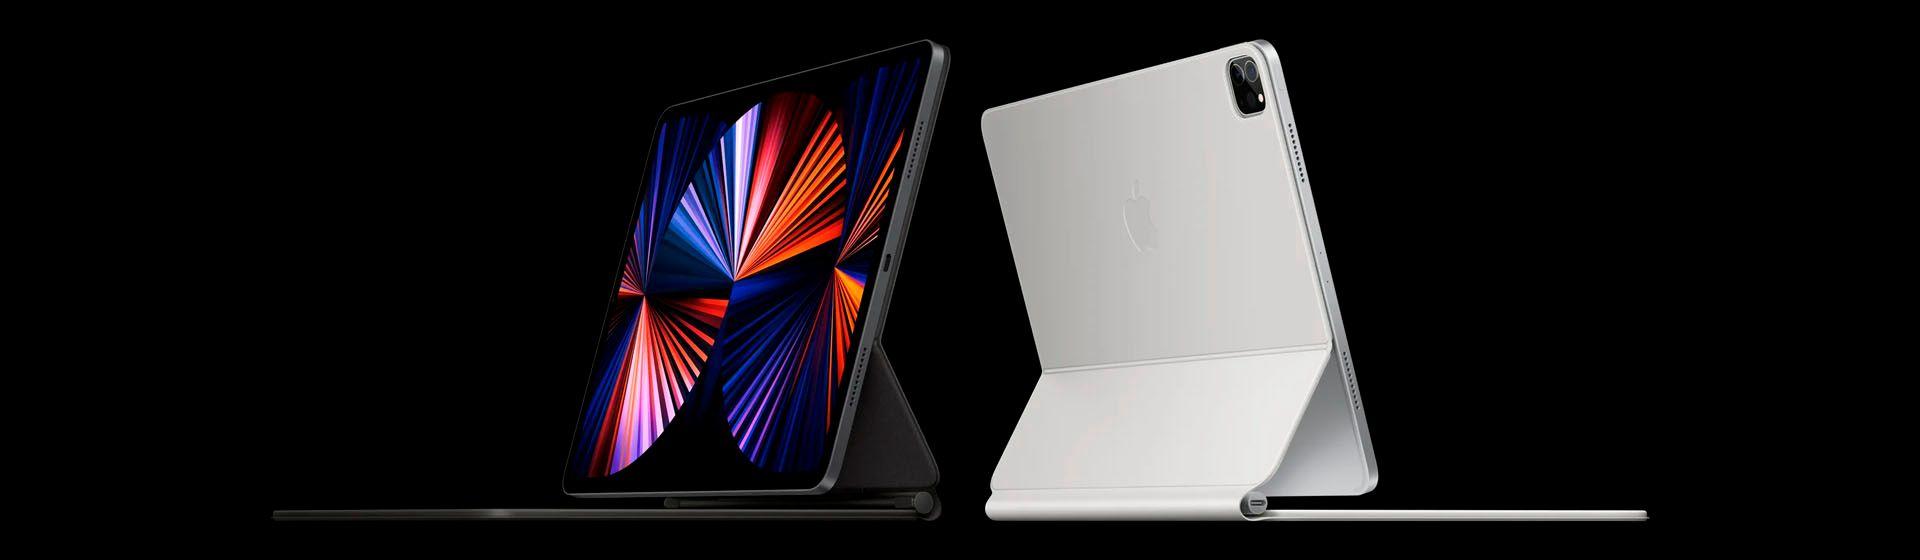 Apple lança novo iPad Pro, iMac com M1, AirTags, Apple TV 4K e iPhone 12 roxo